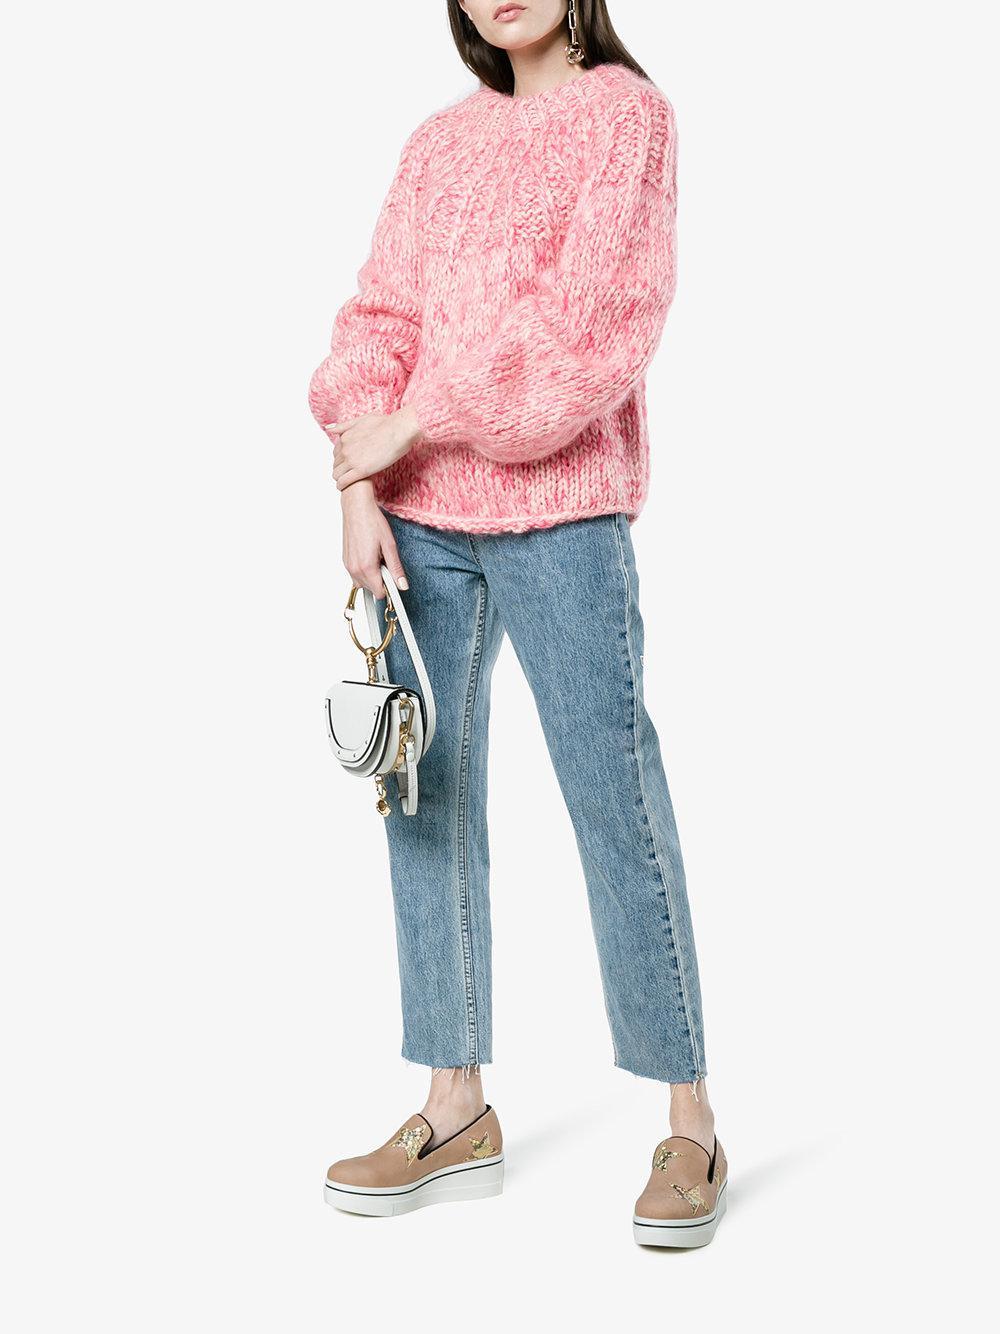 Stella McCartney Rubber Pink Binx 45 Slip On Platform Sneakers in Beige (Natural)